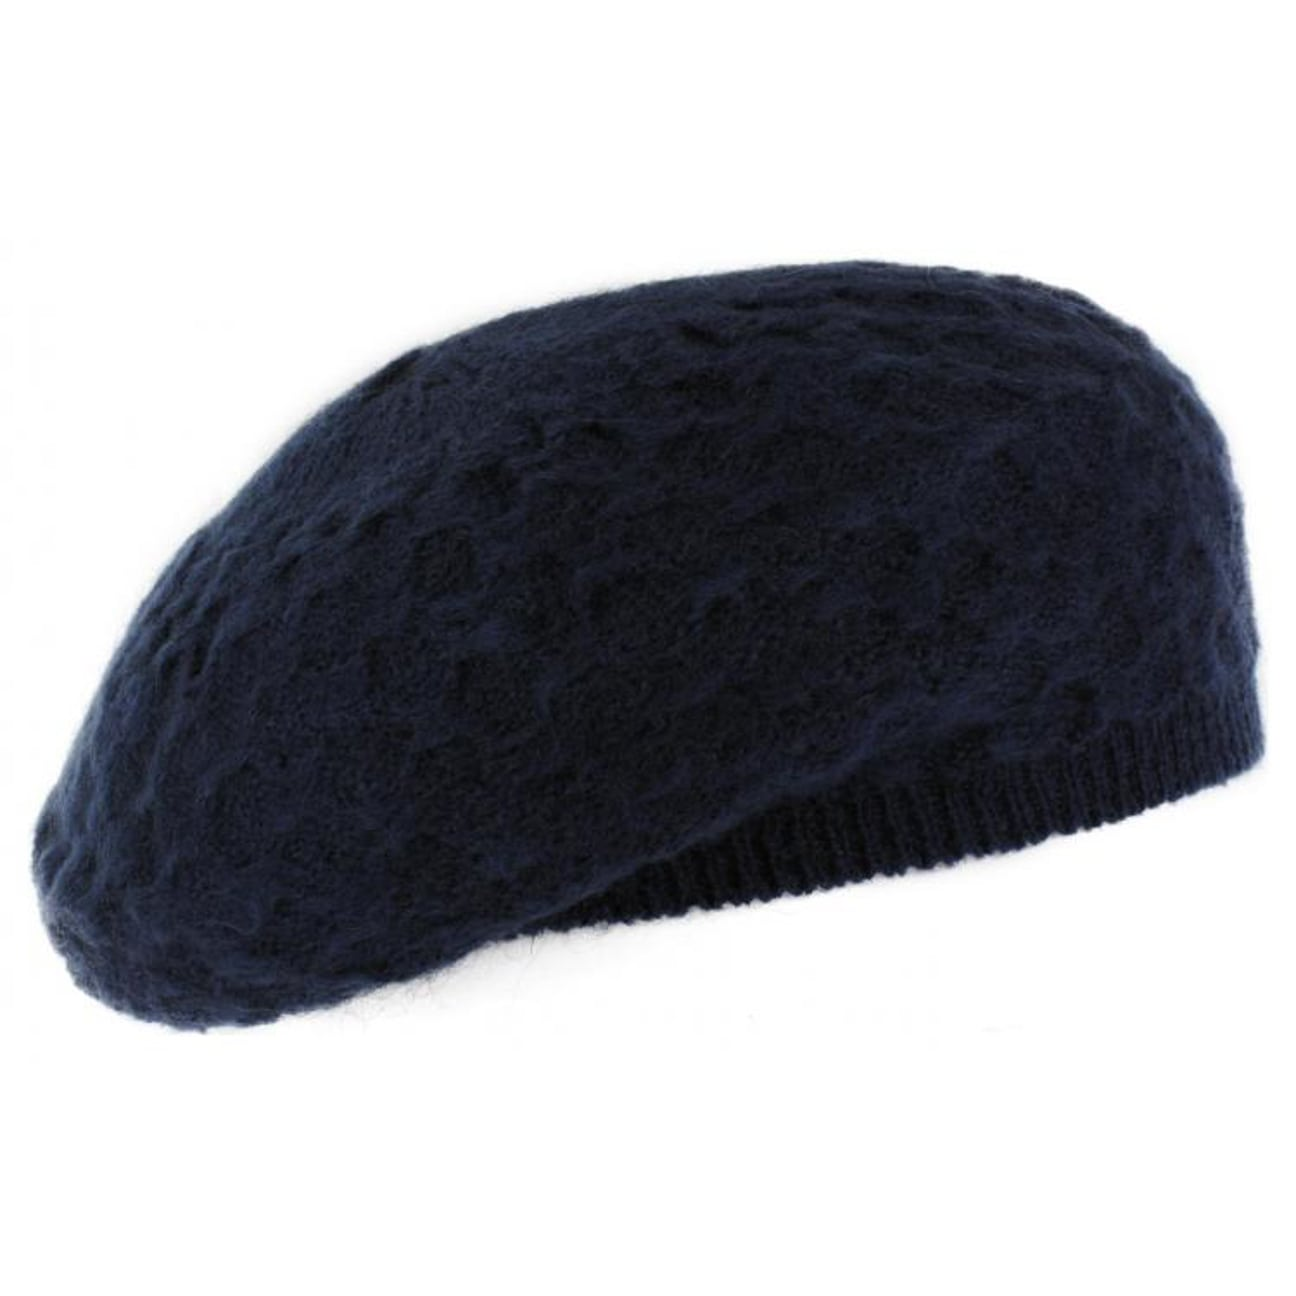 Free Knitting Pattern Mohair Beret : Niokolo Mohair Knit Beret by McBURN, EUR 14,95 --> Hats, caps & beanie...